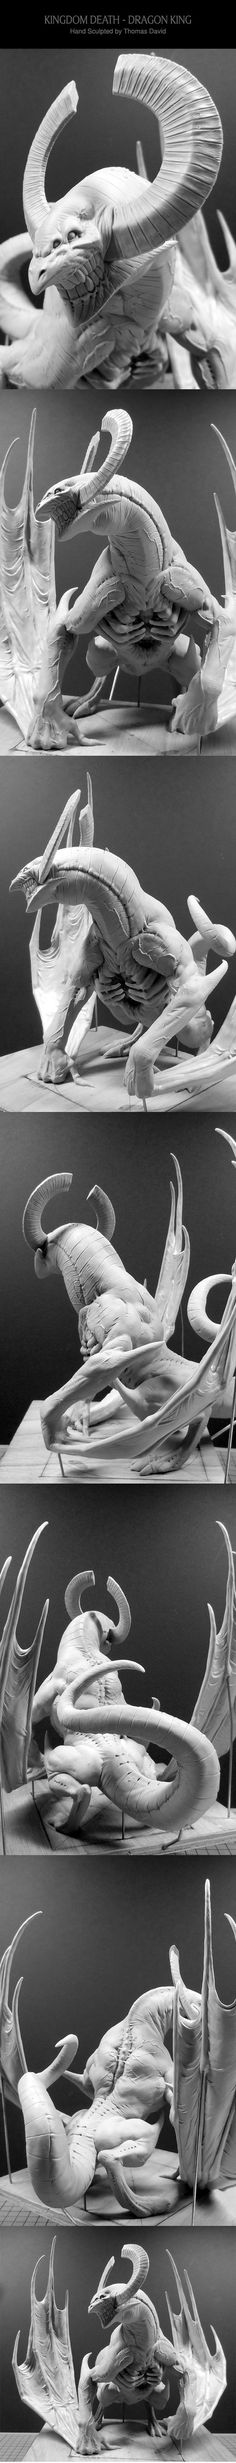 Dragon King Expansion - Kingdom Death